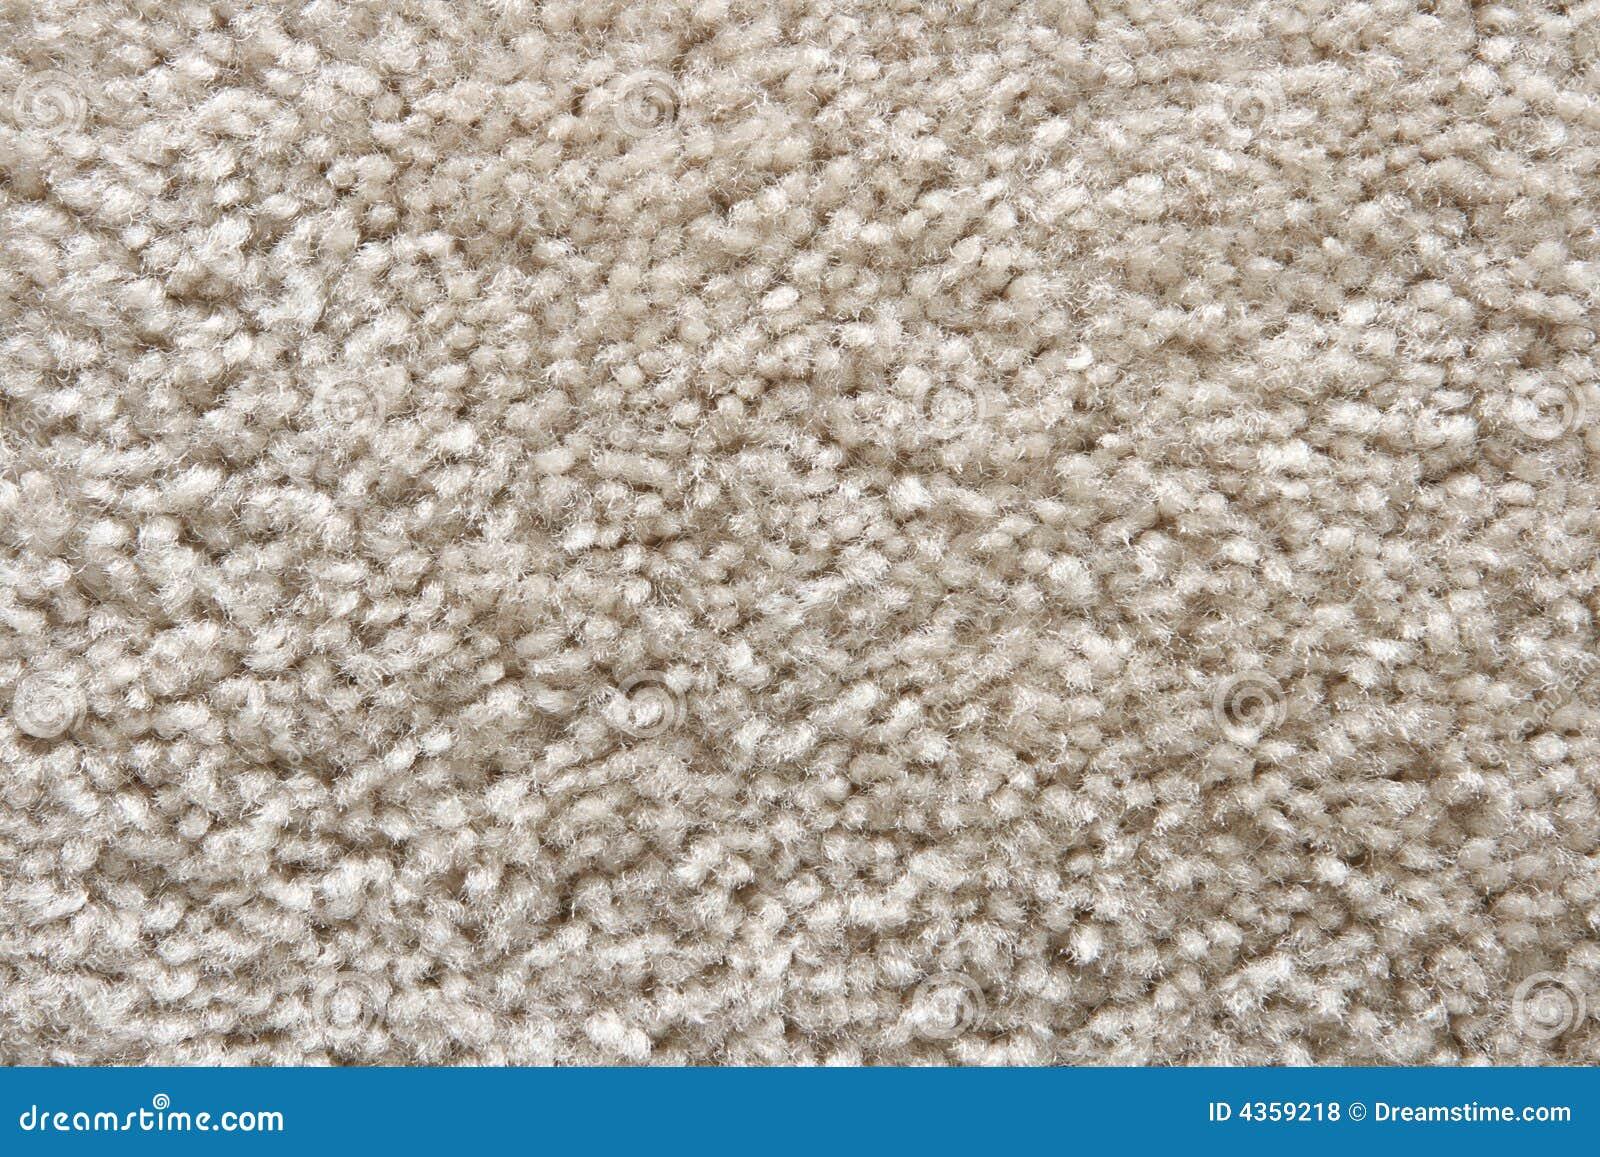 Shag pile carpet deep pile carpet  Carpet by AW